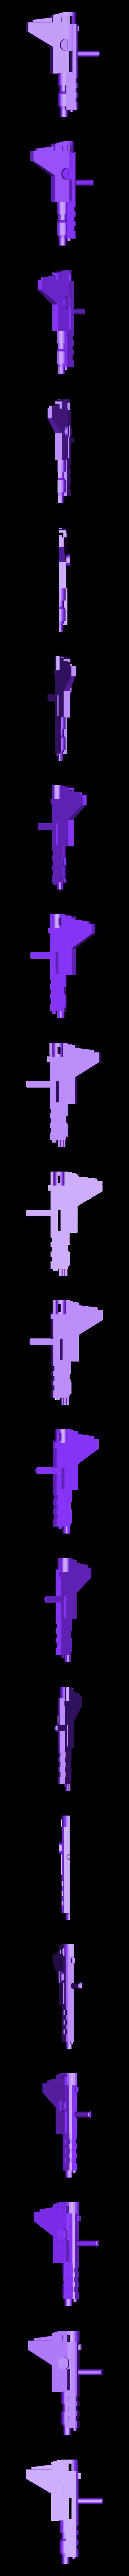 Gun5roundhandle.stl Download STL file KO TFC Uranos Upgrade Kit IDW Ver • 3D printer object, Toymakr3D